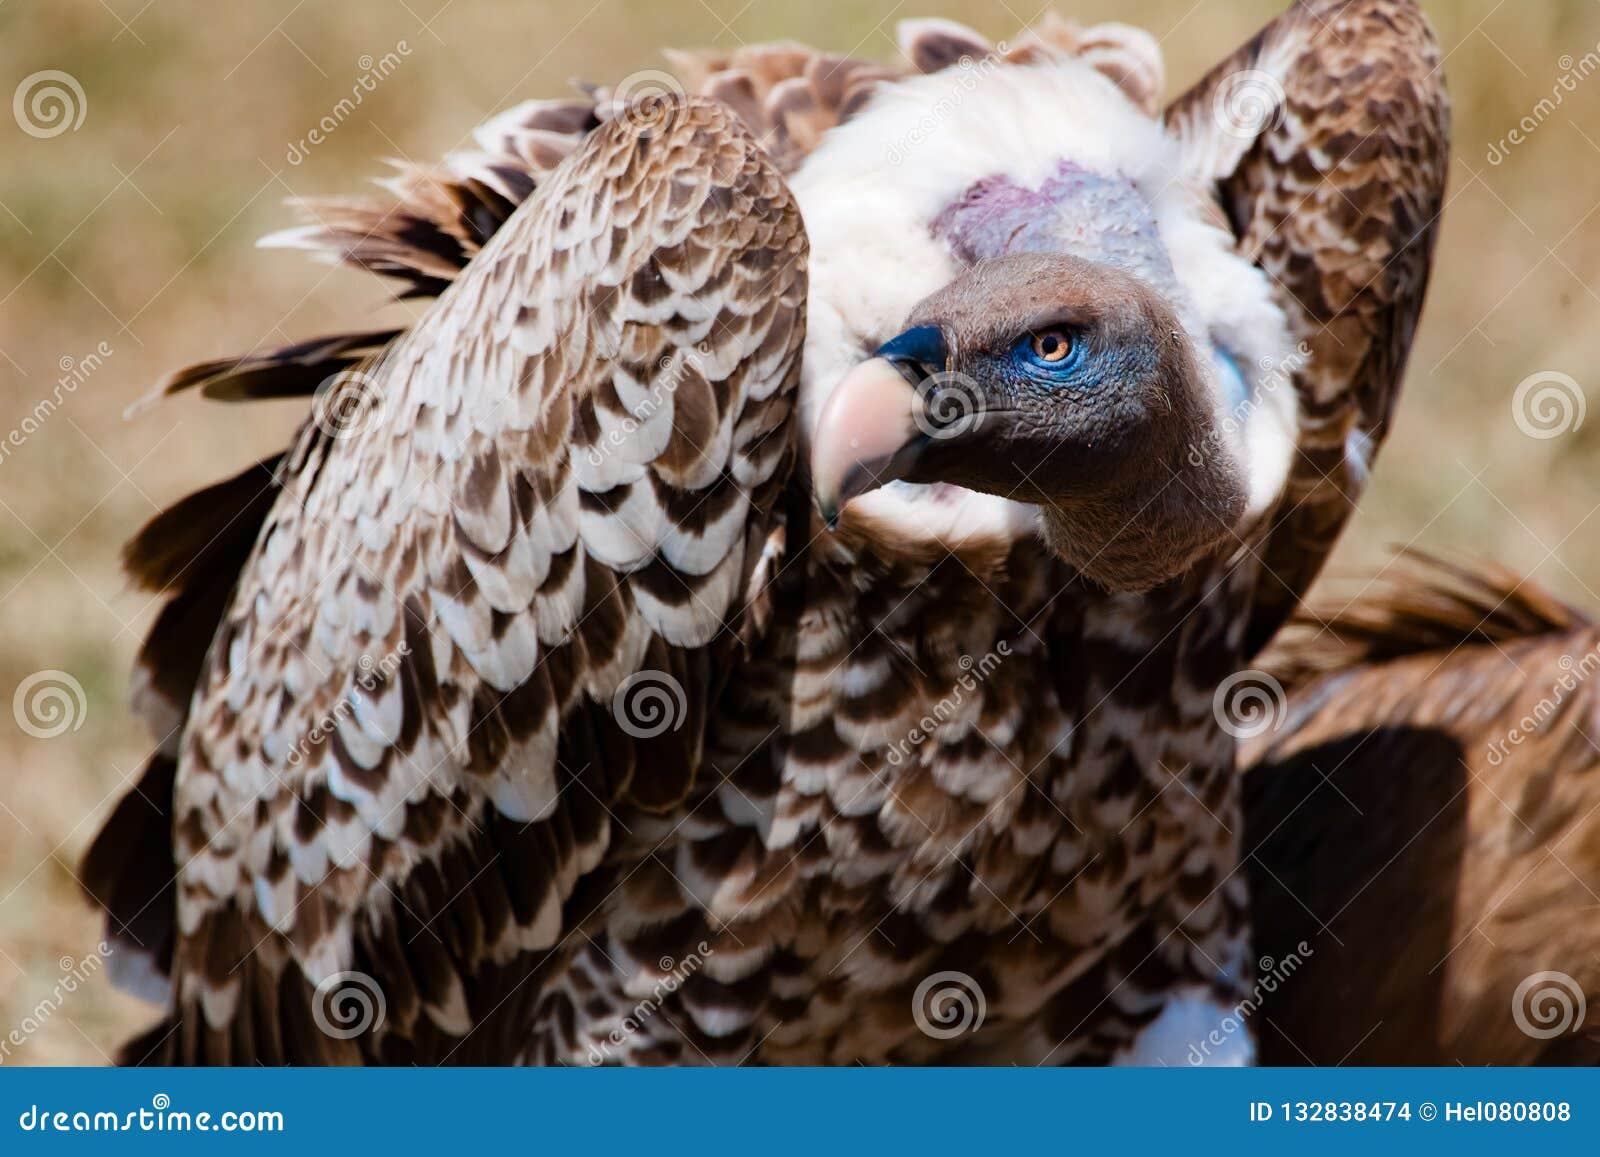 Vulture feeding on carcass in Serengeti, Tanzania, Africa